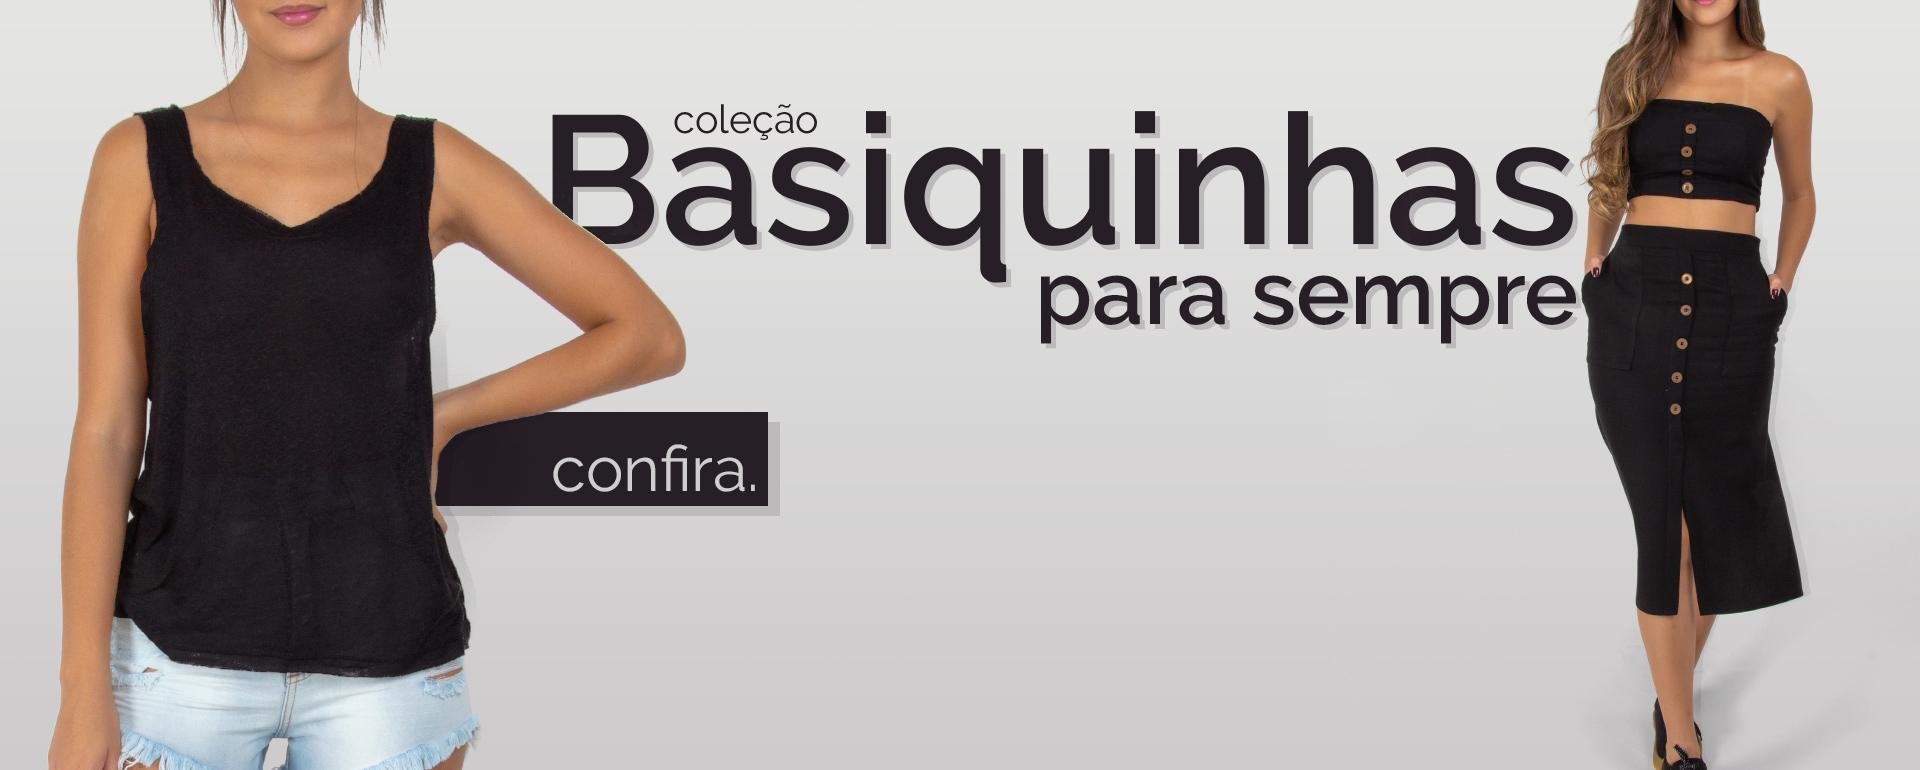 colec-basic